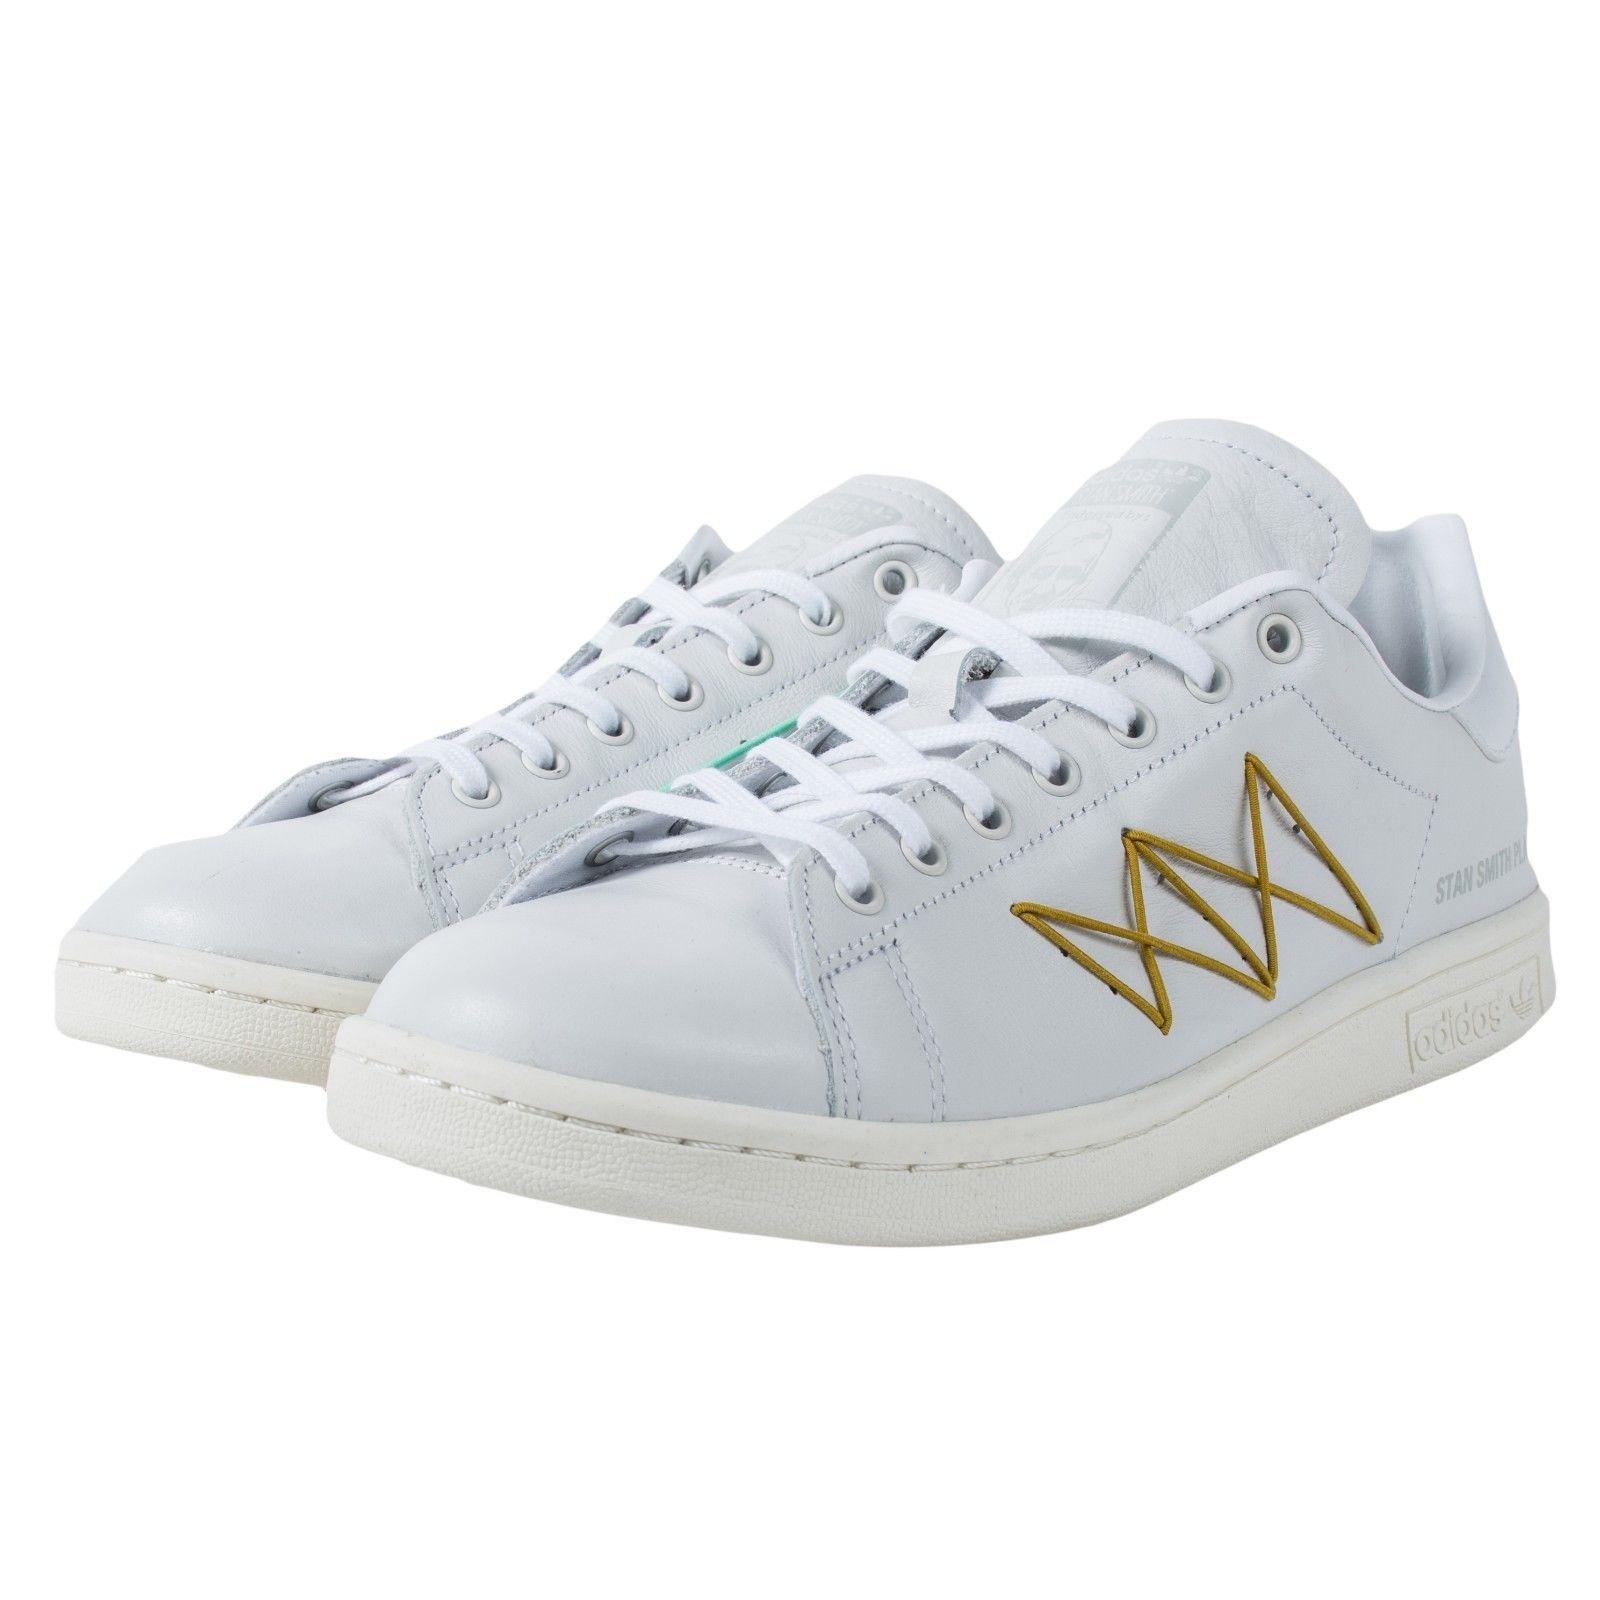 Sneakersnstuff y3